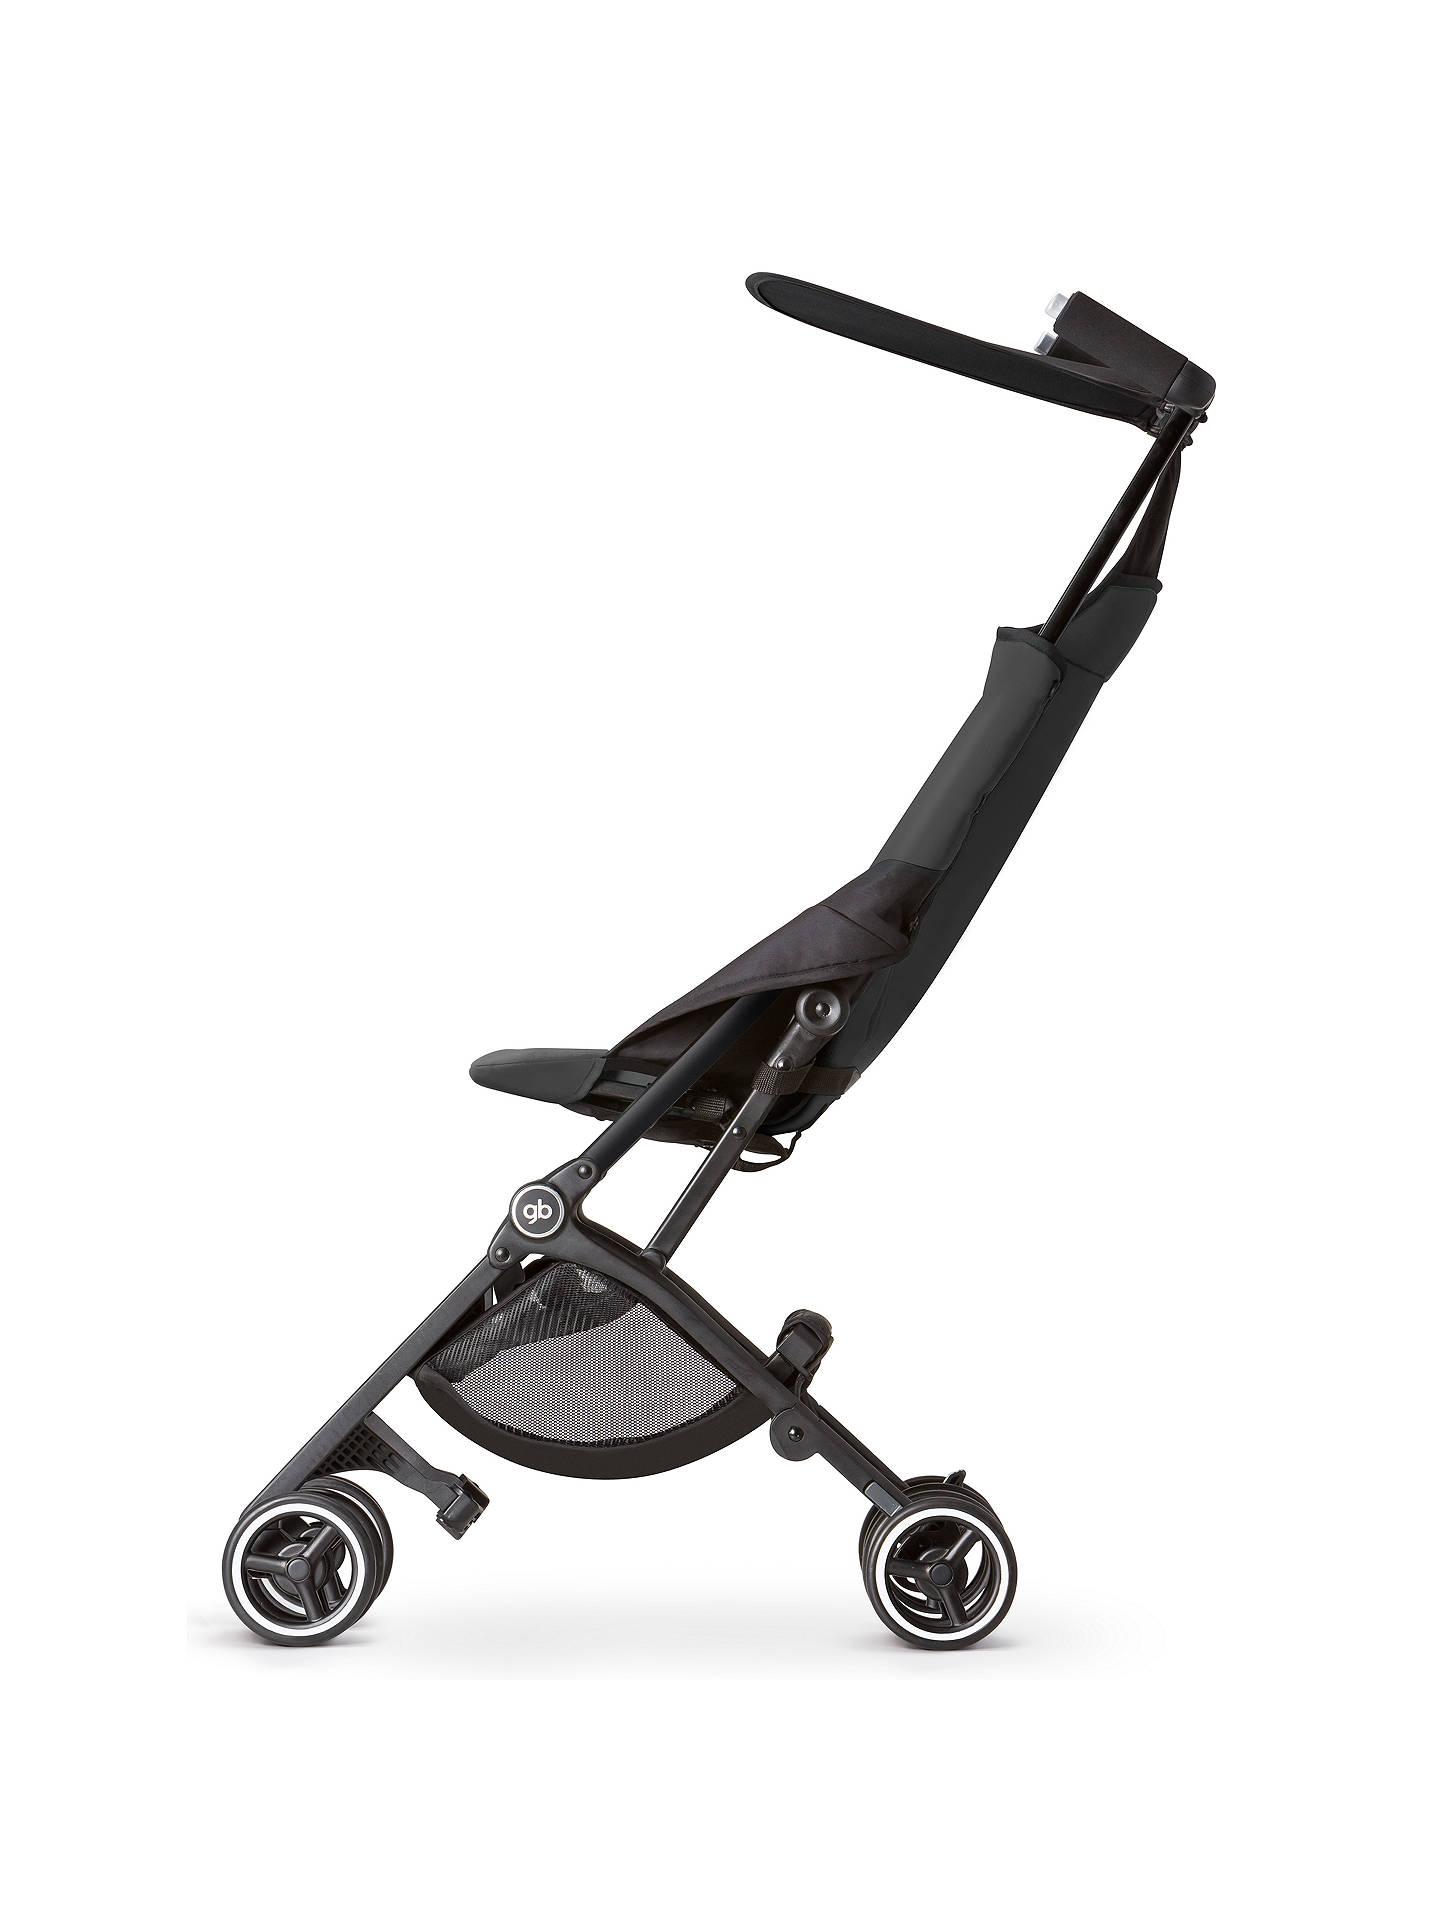 GB Pockit Stroller, Black at John Lewis & Partners